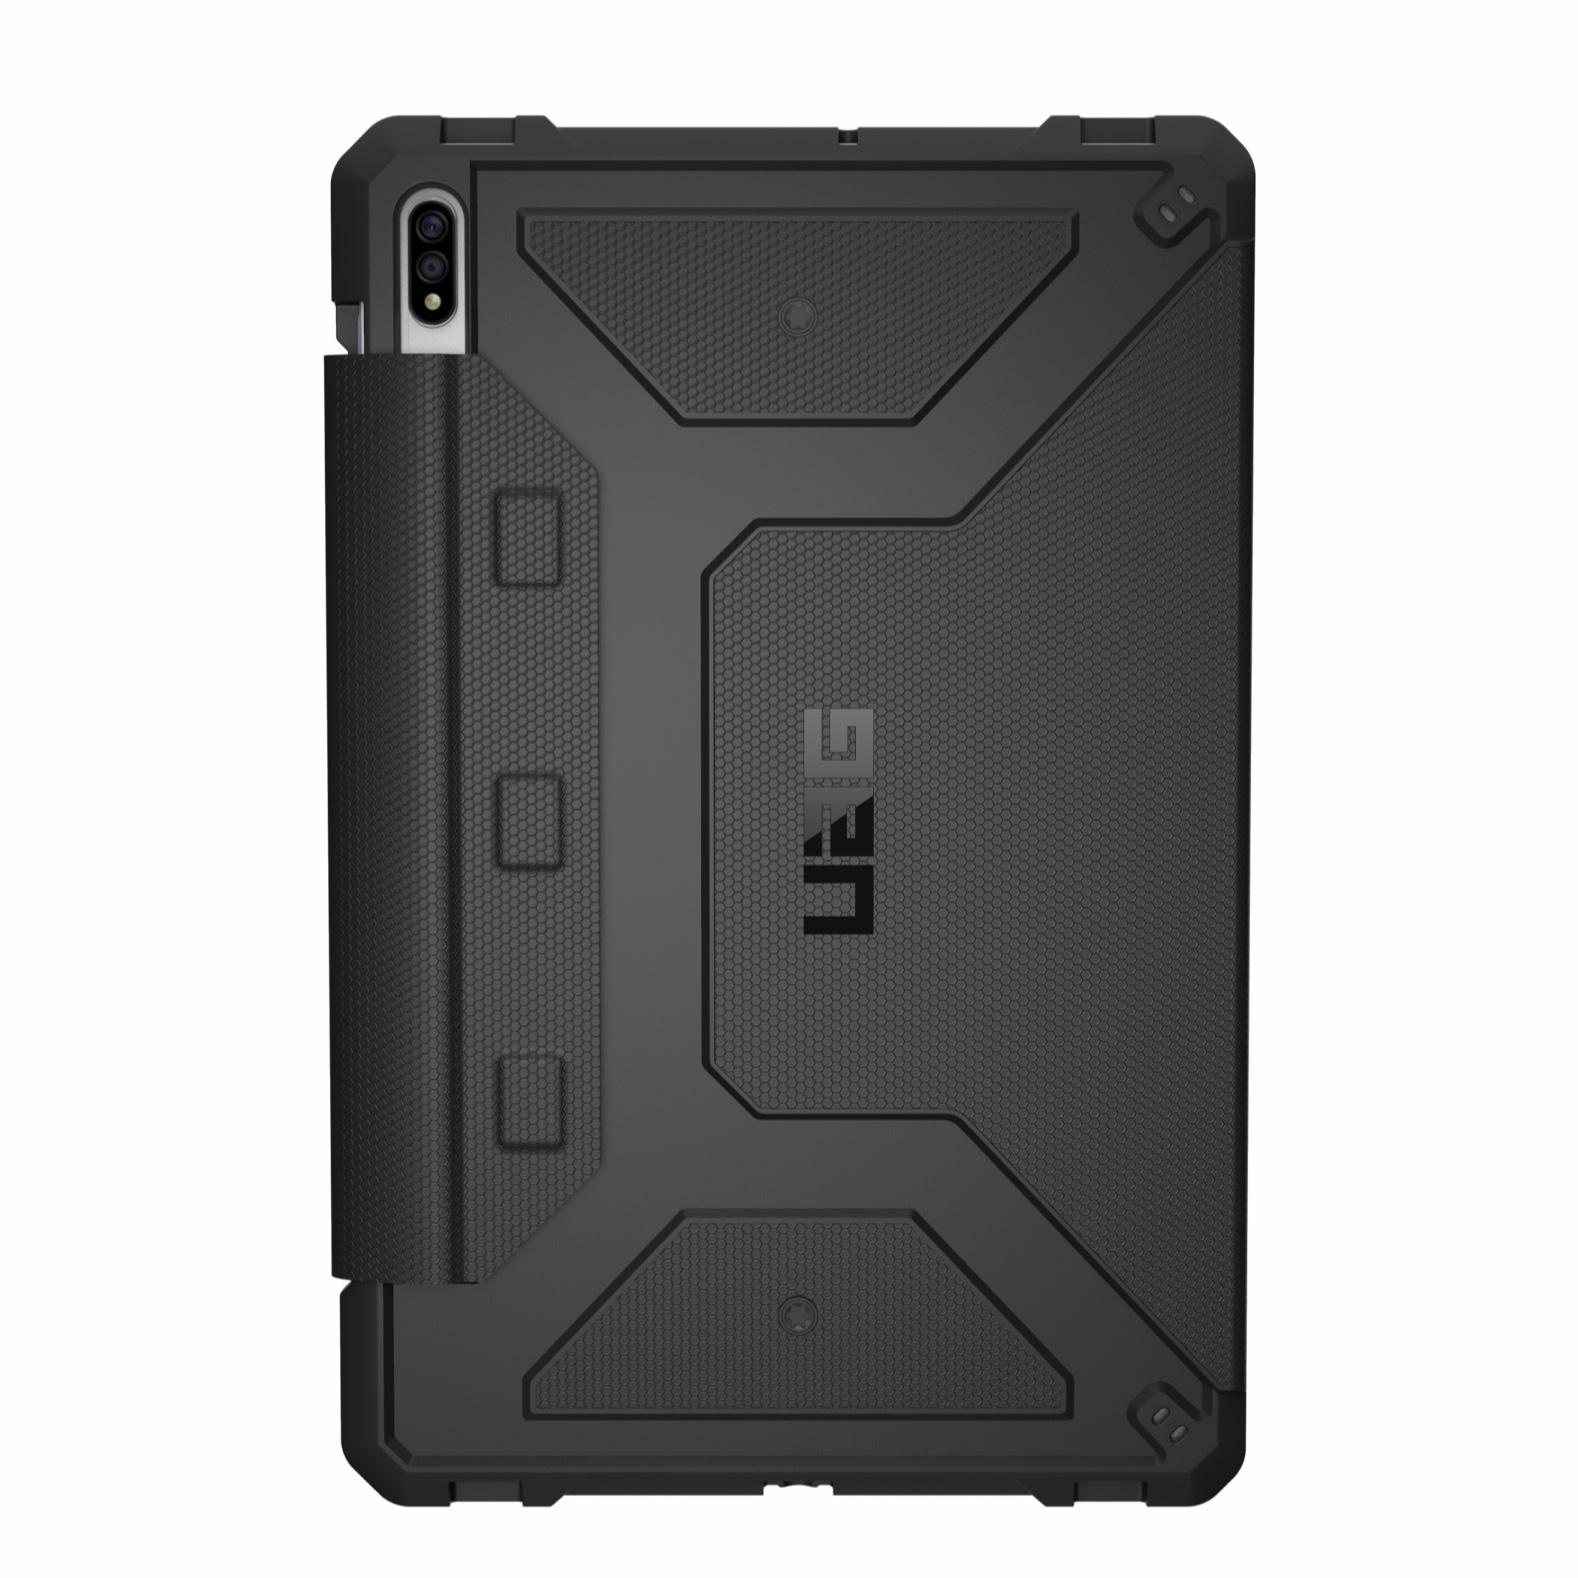 REF 2549 Etui Folio Galaxy TAB S7 FE 12.4 pouces Armure Multi angles